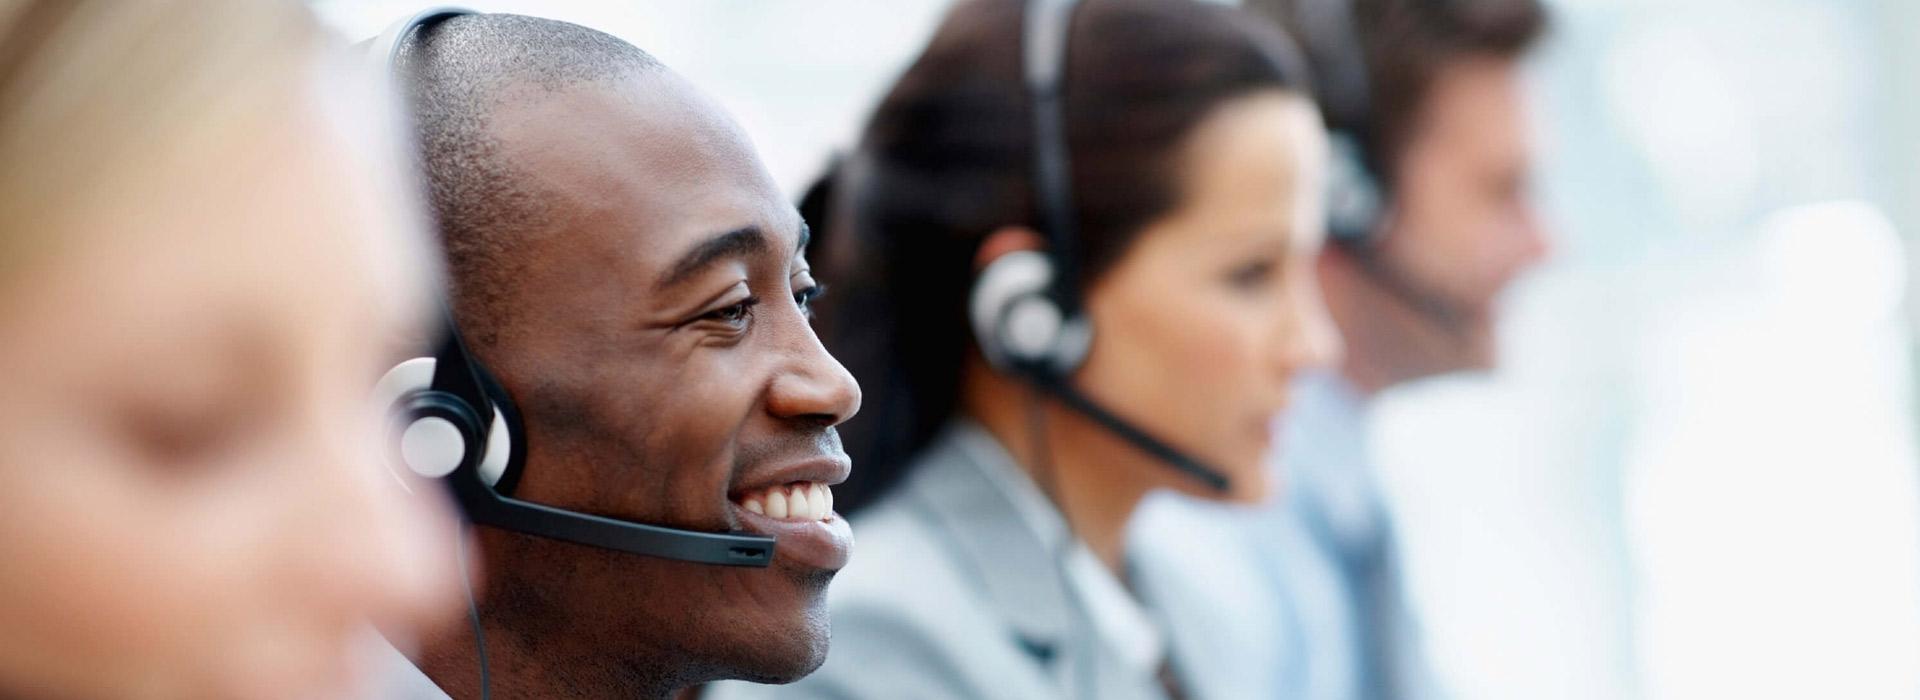 Customer Service Policy